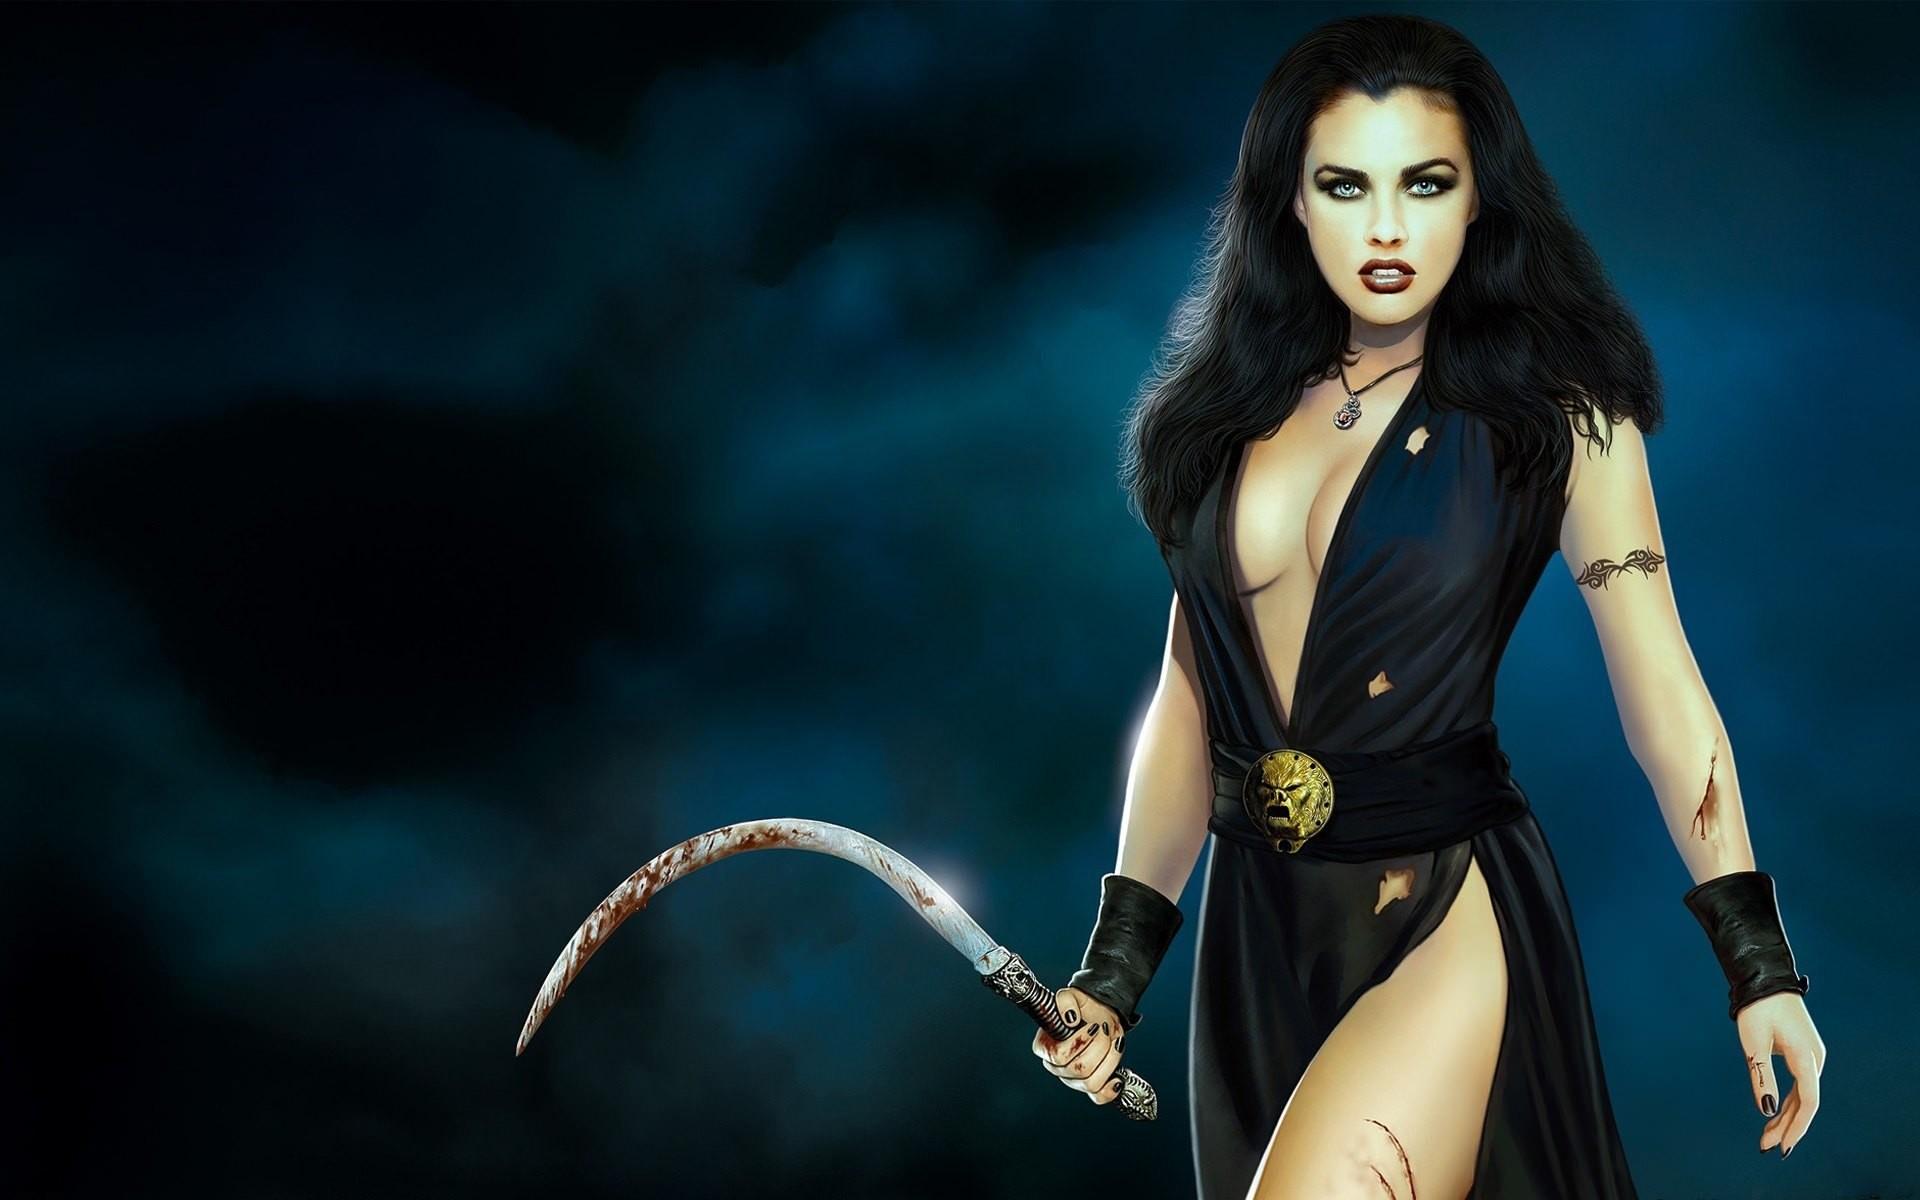 Fantasy Women Warrior Woman Wallpaper 197646